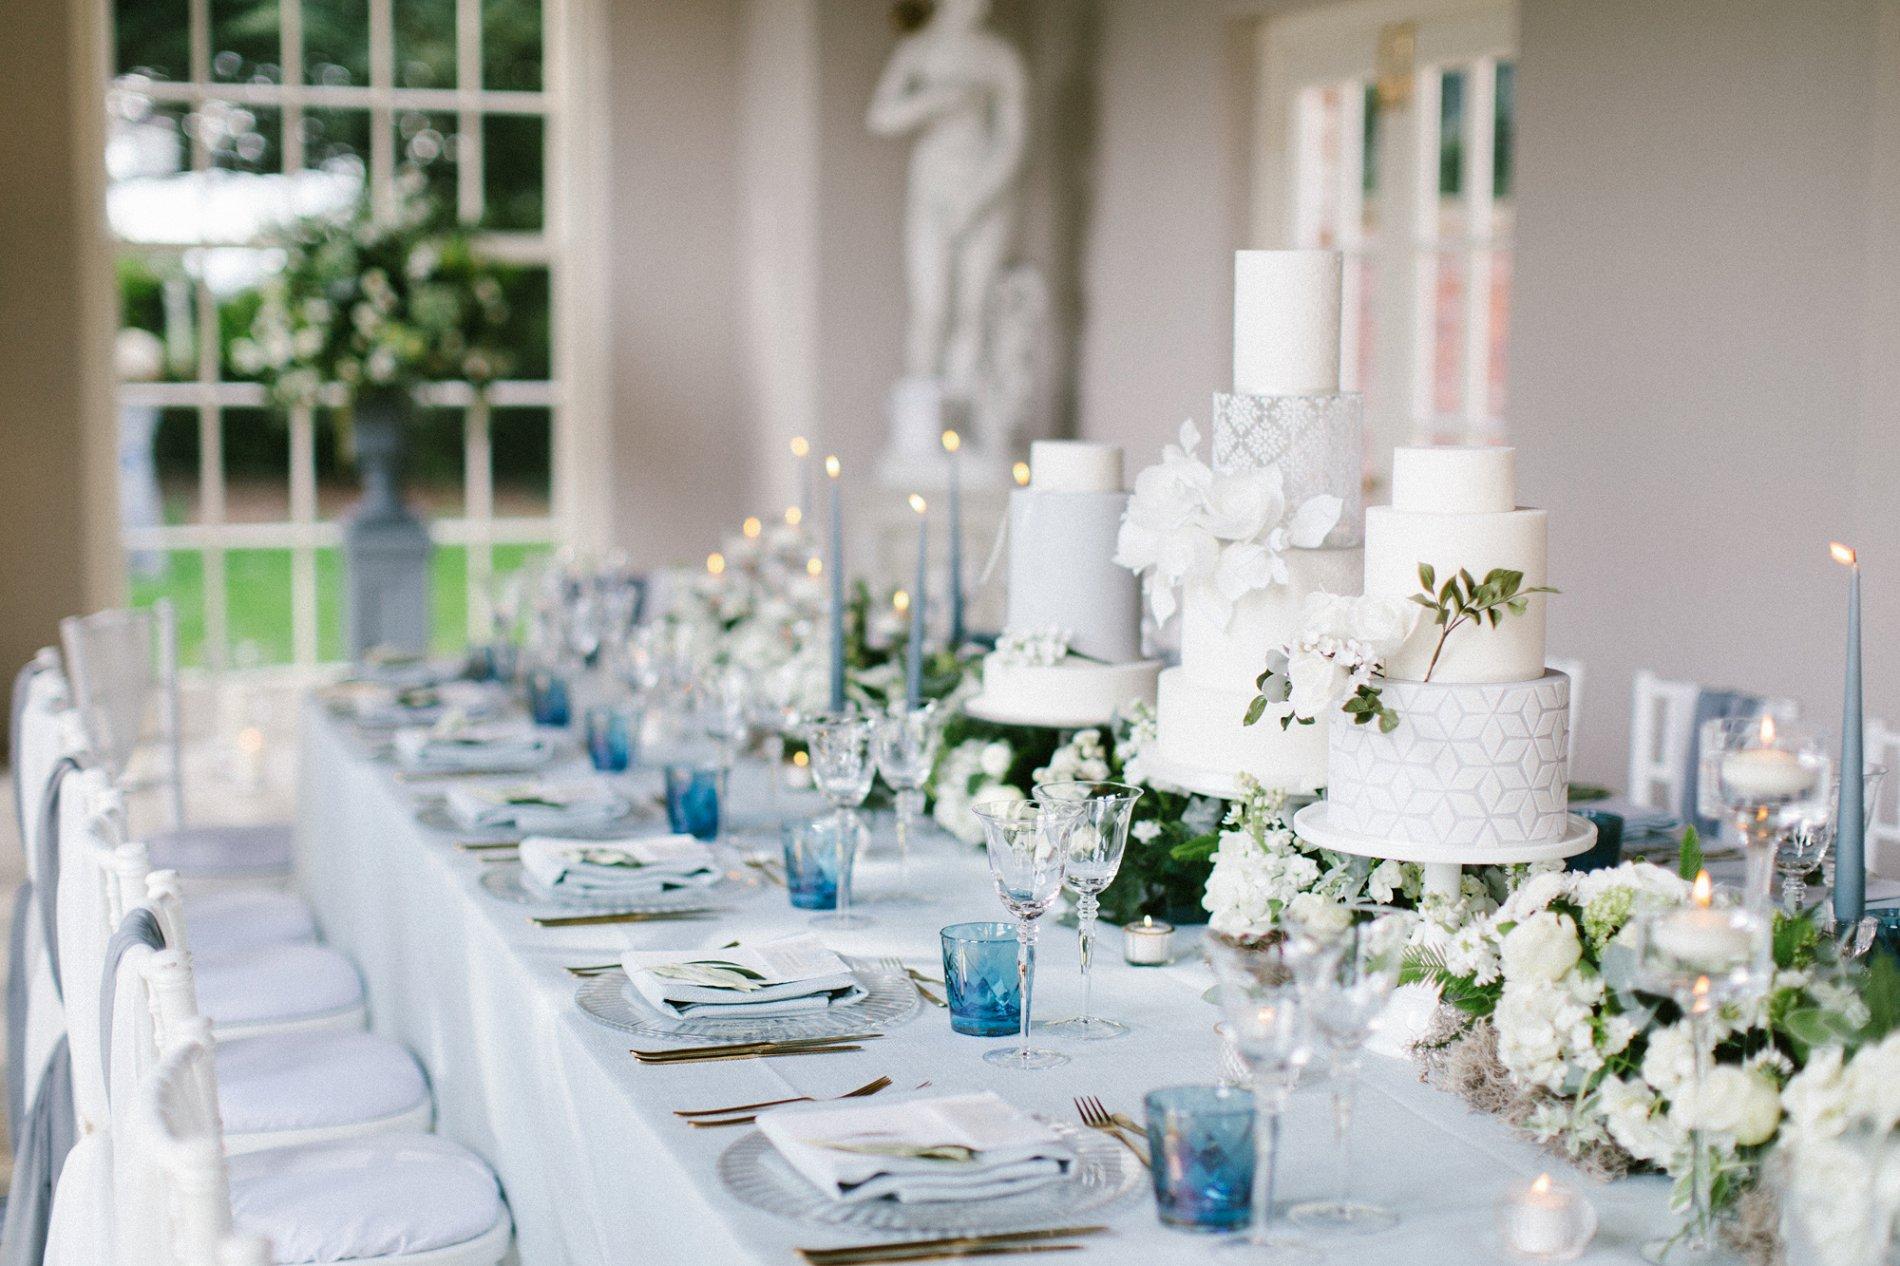 An Intimate Fine Art Wedding Shoot at Newby Hall (c) Melissa Beattie Photography (24)